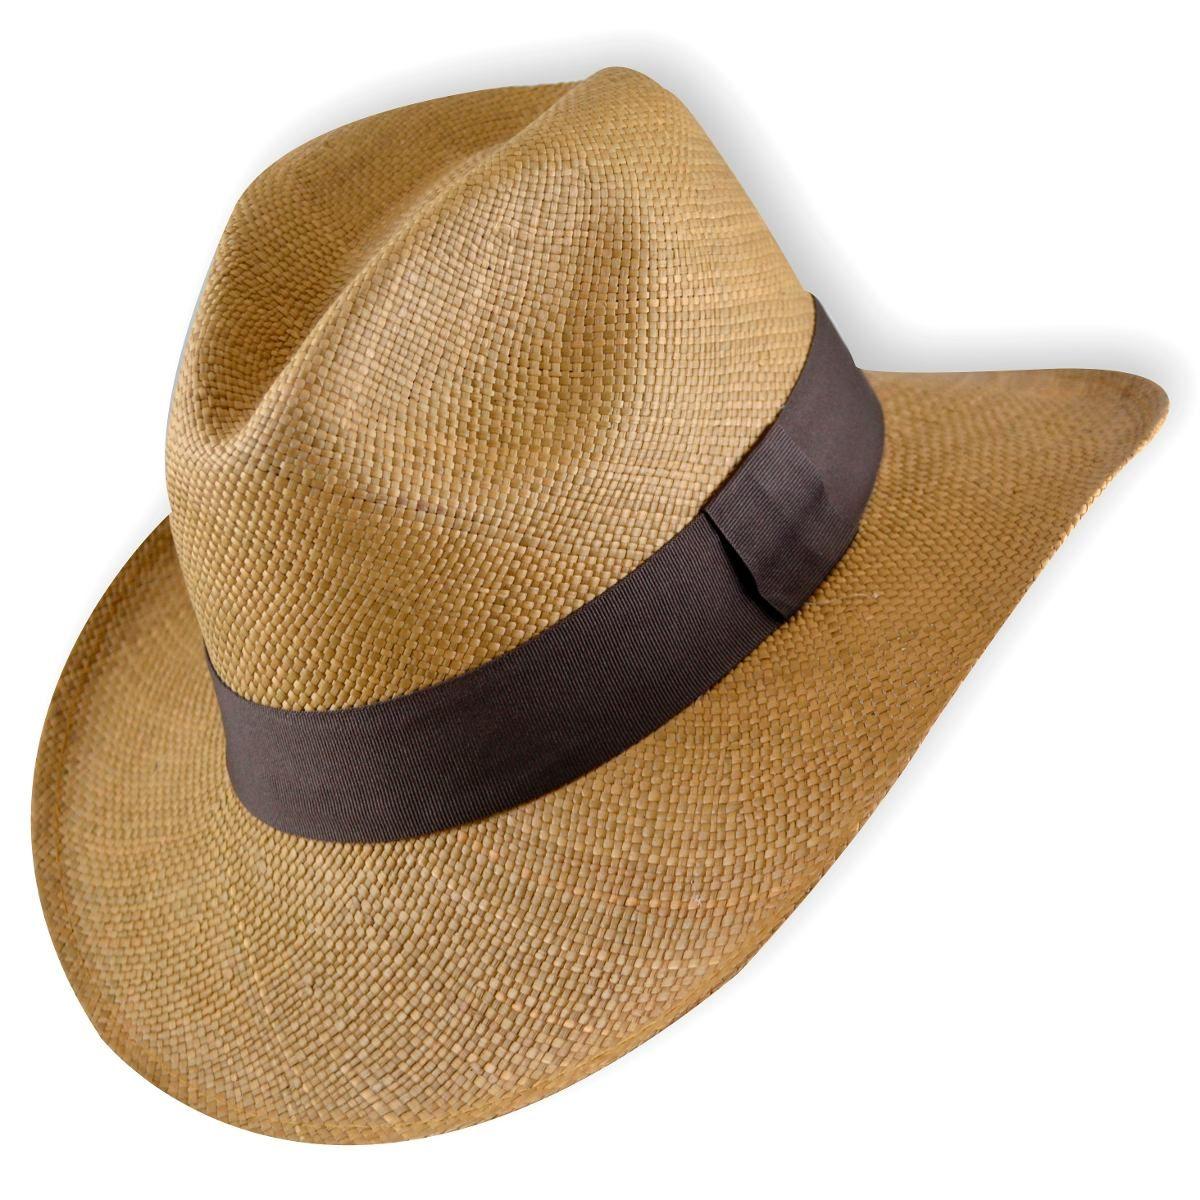 sombrero panamá de ecuador jipijapa para hombre  5c86622efa3